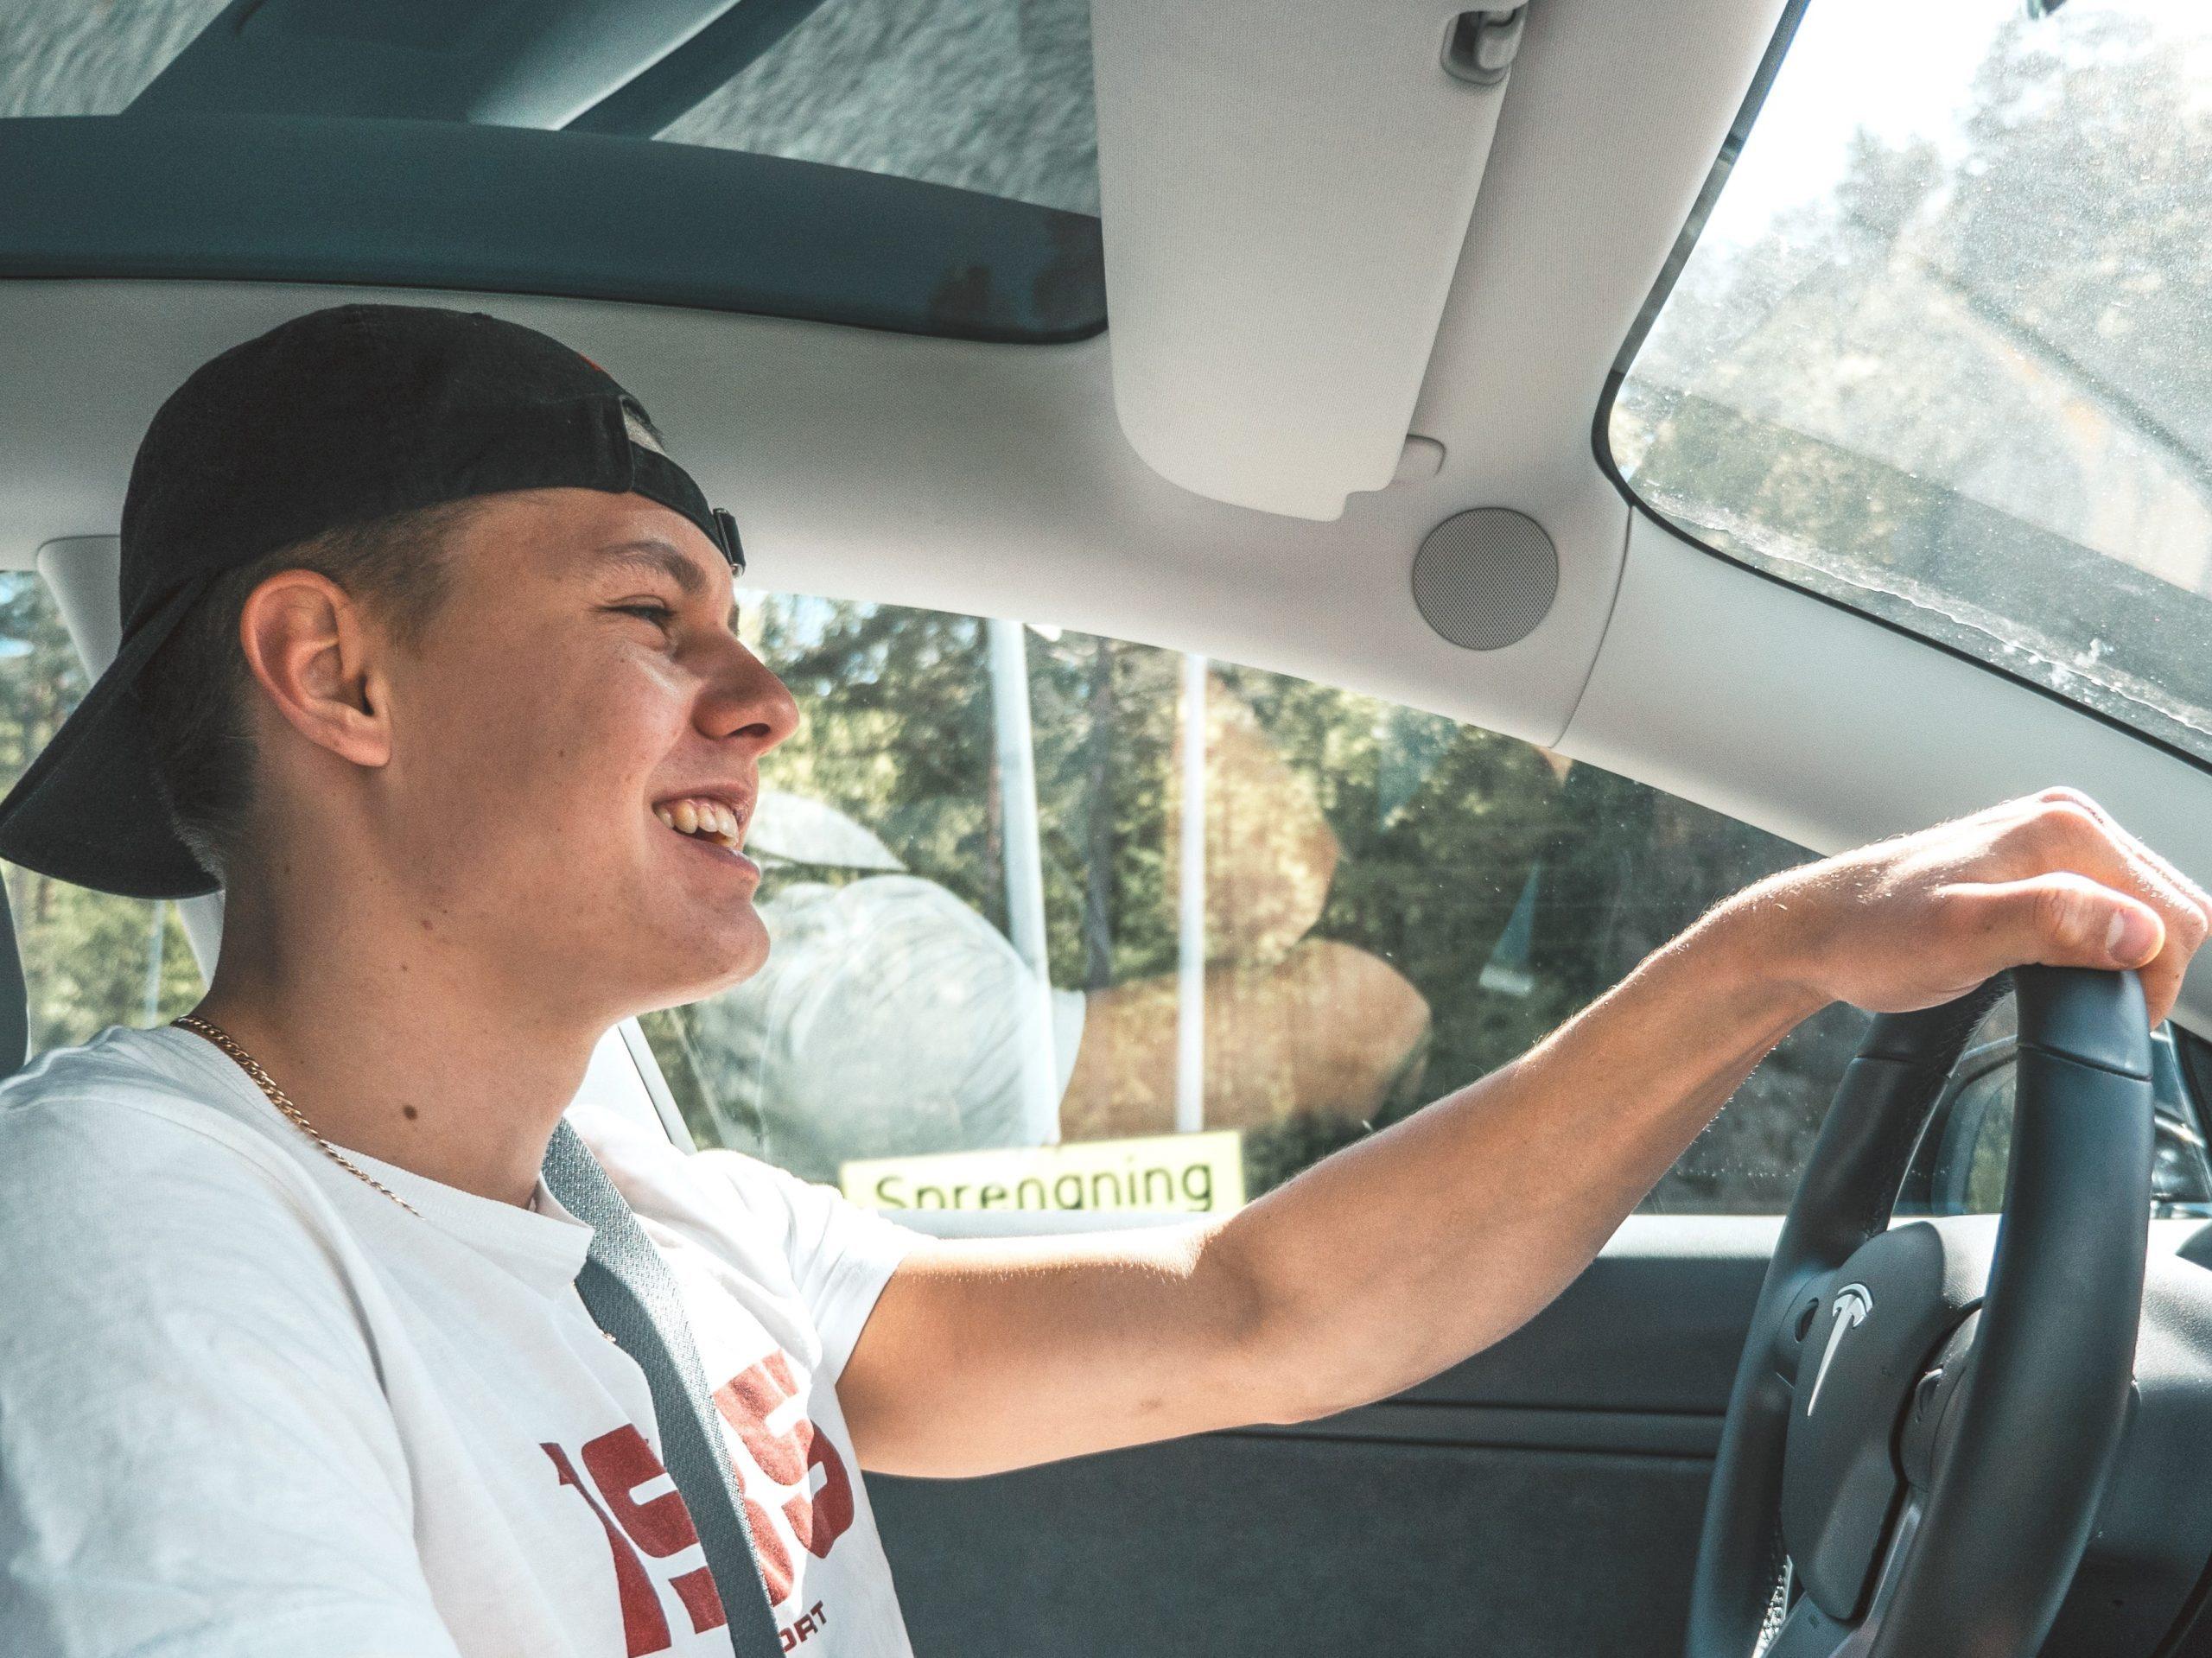 How do I get a hardship driver's license?